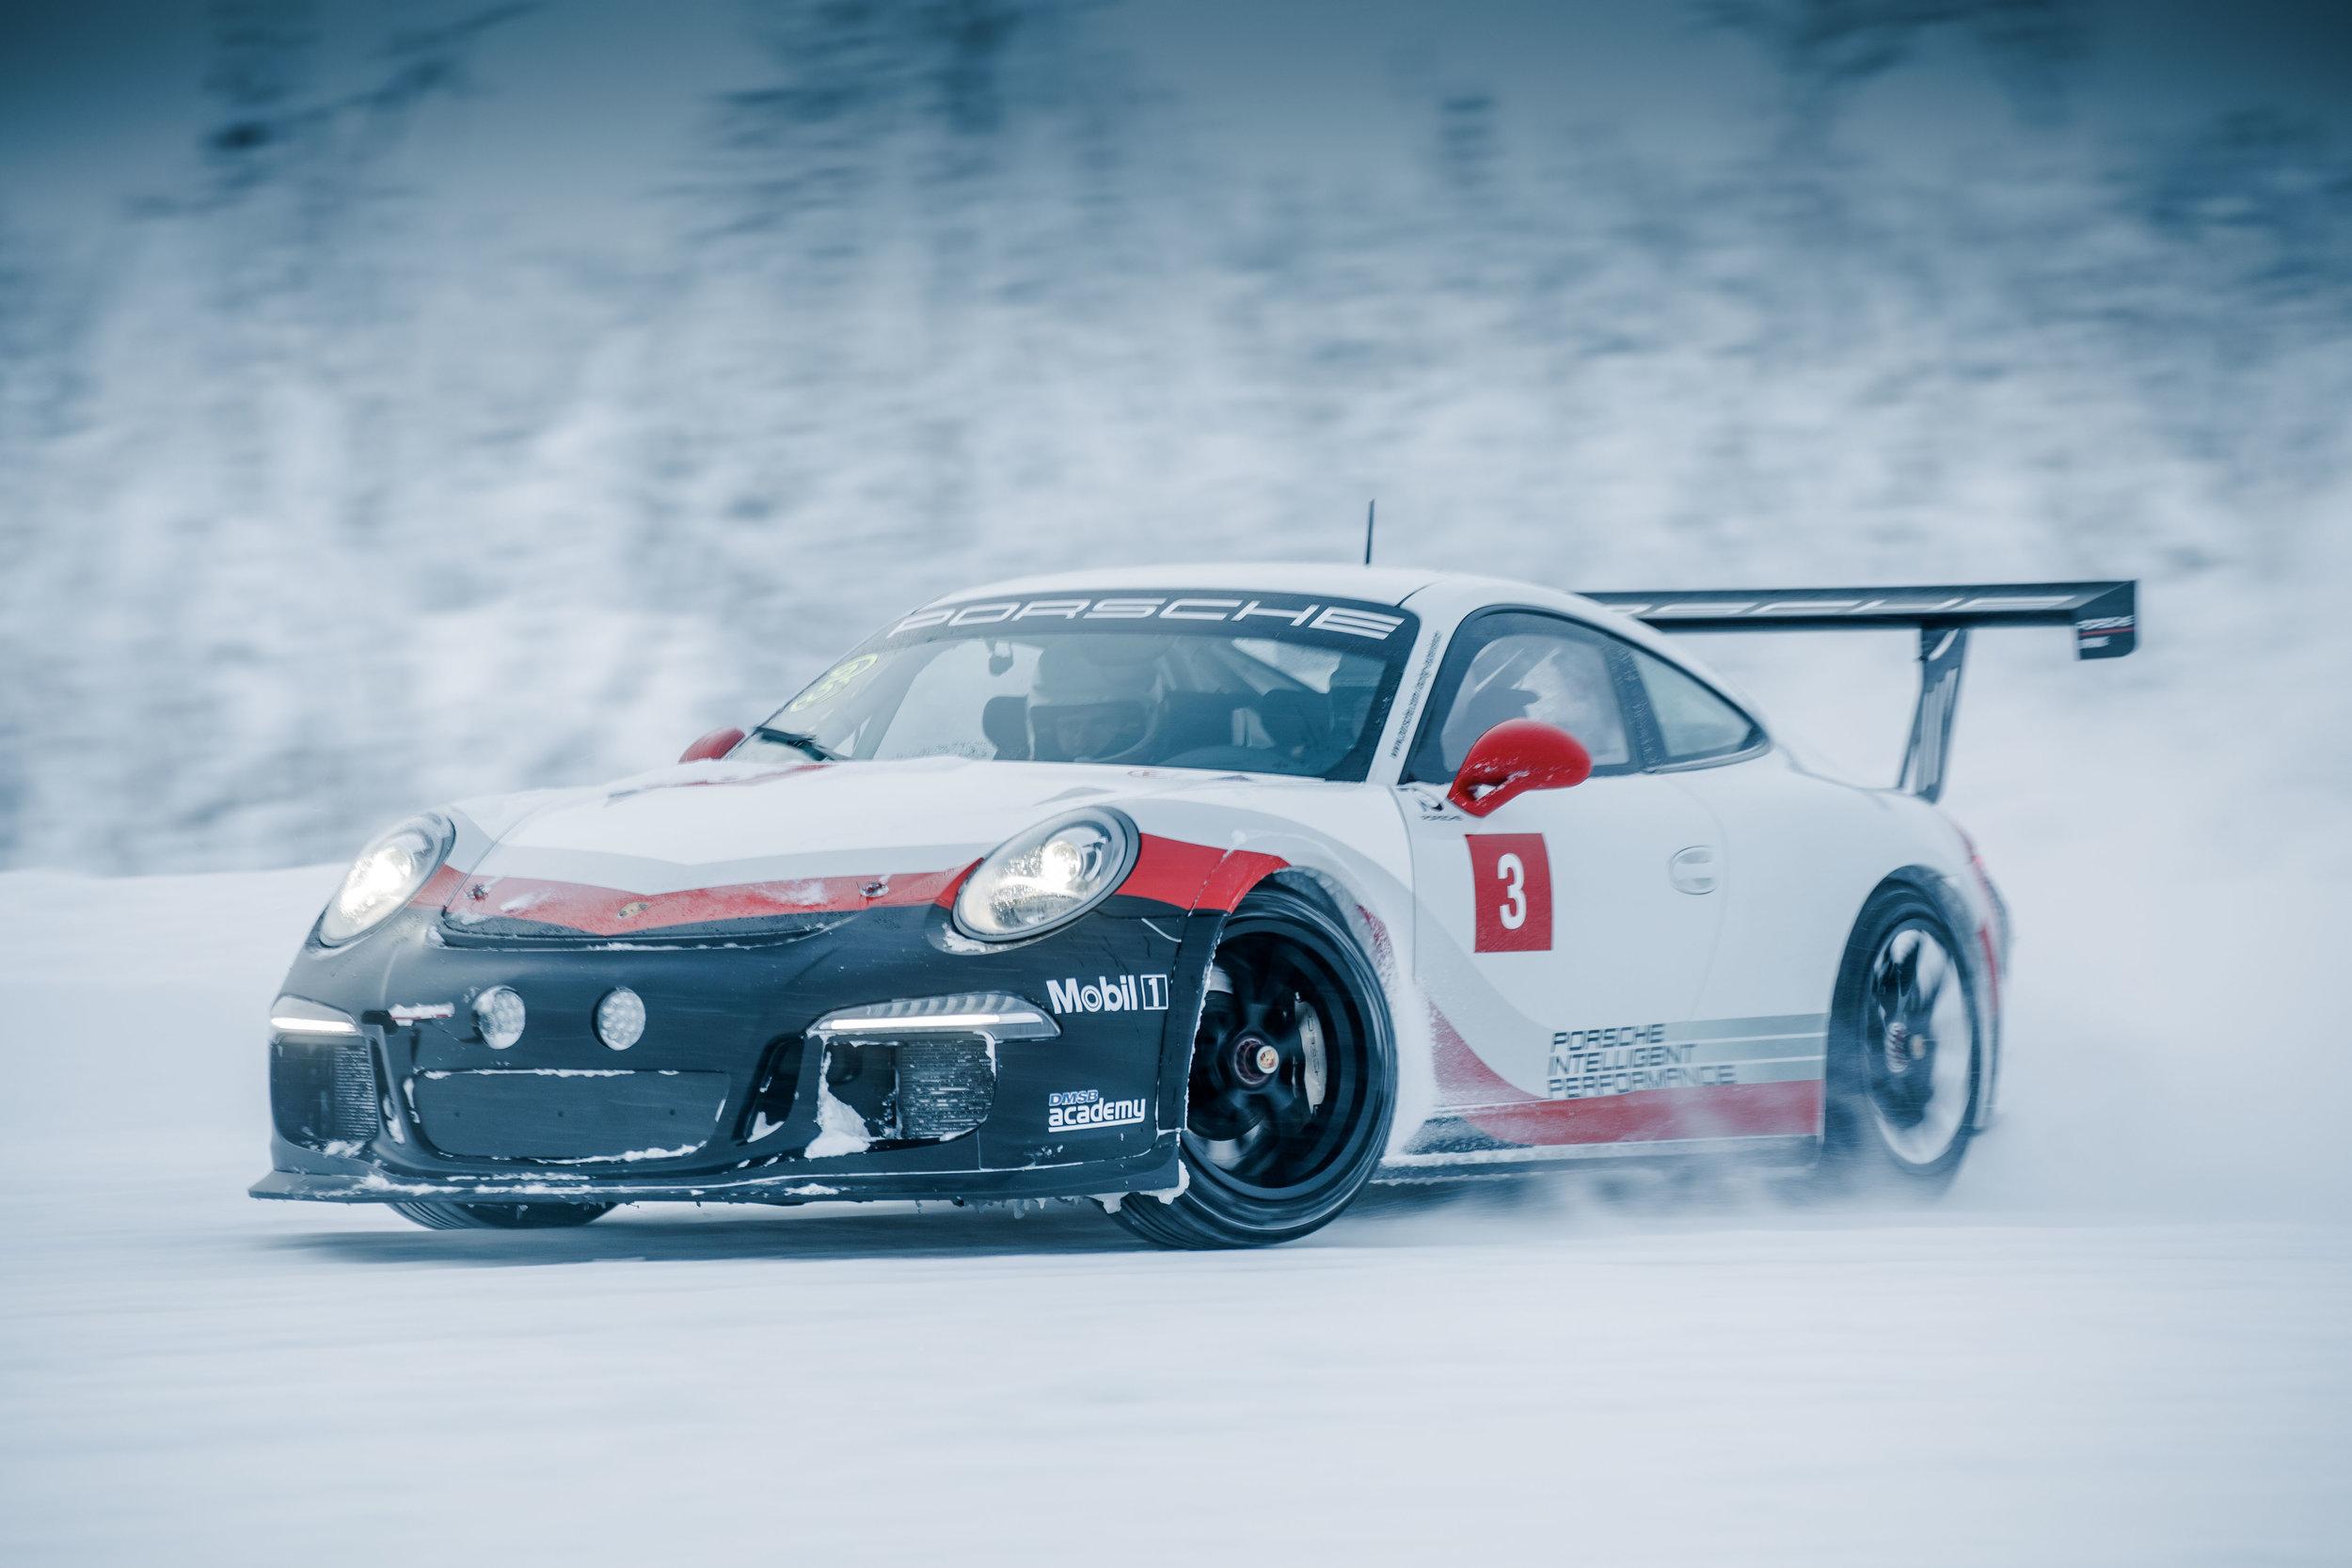 Porsche Ice Experience on Ice_30_01_2019_0413_175675.jpg